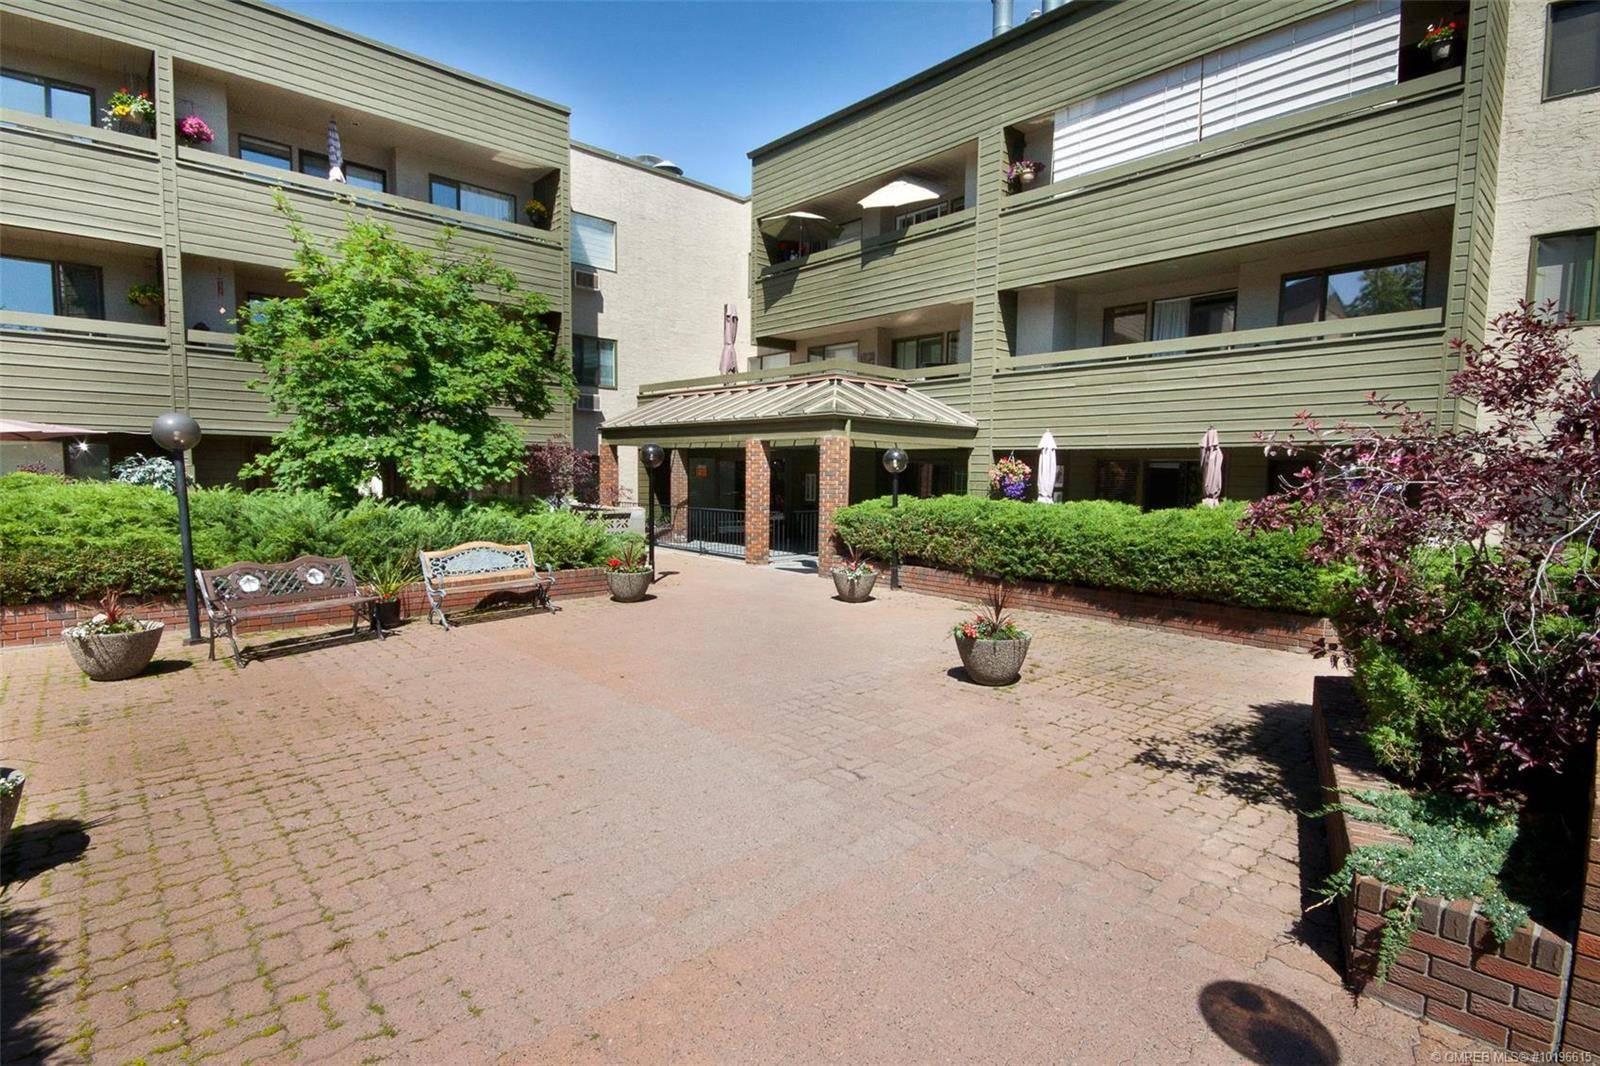 Condo for sale at 1056 Bernard Ave Unit 305 Kelowna British Columbia - MLS: 10196615